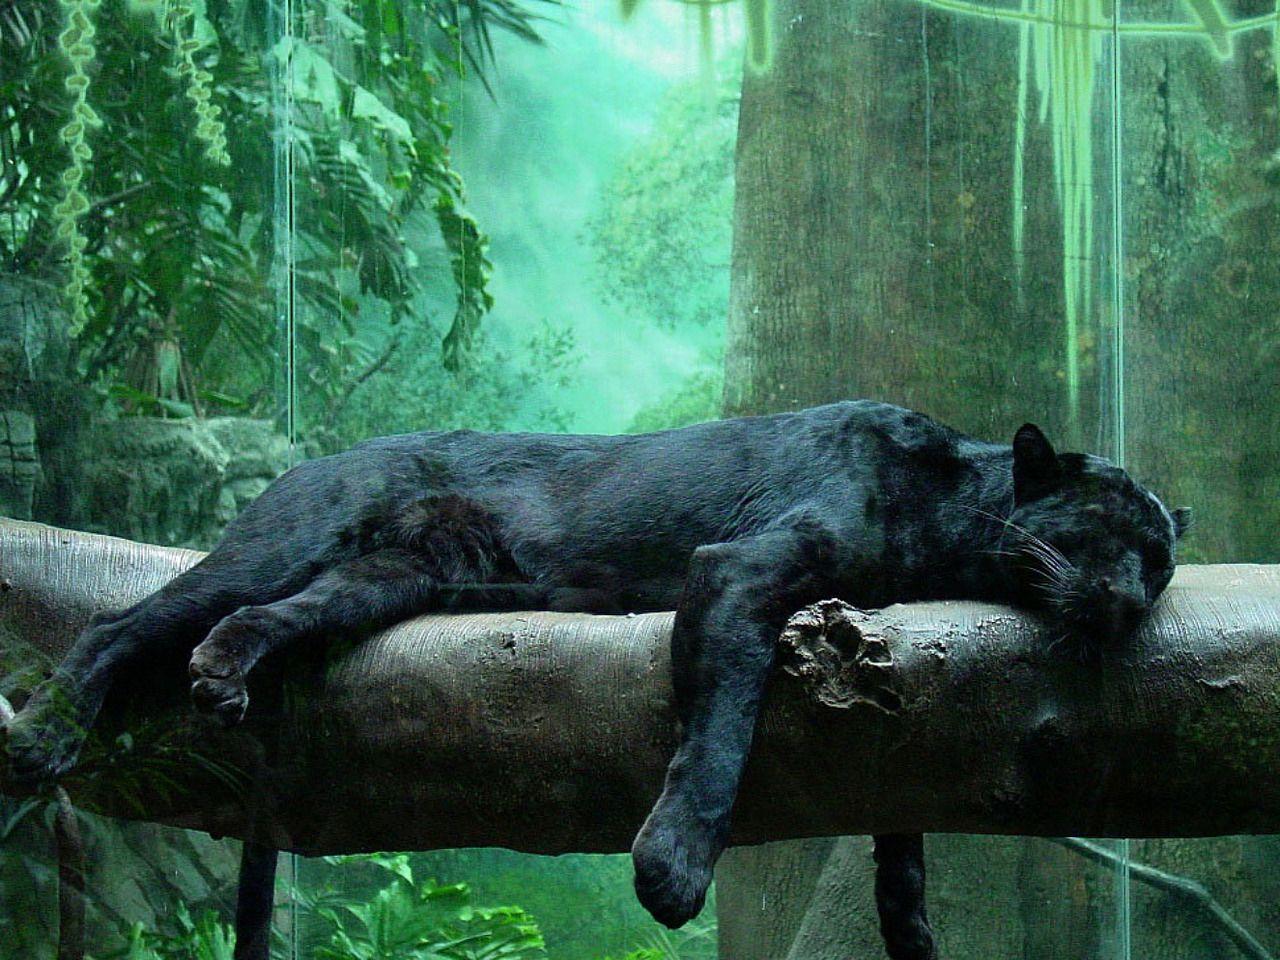 Black Leopard | Panther/Black Leopard | Fun Animals Wiki ... - photo#38